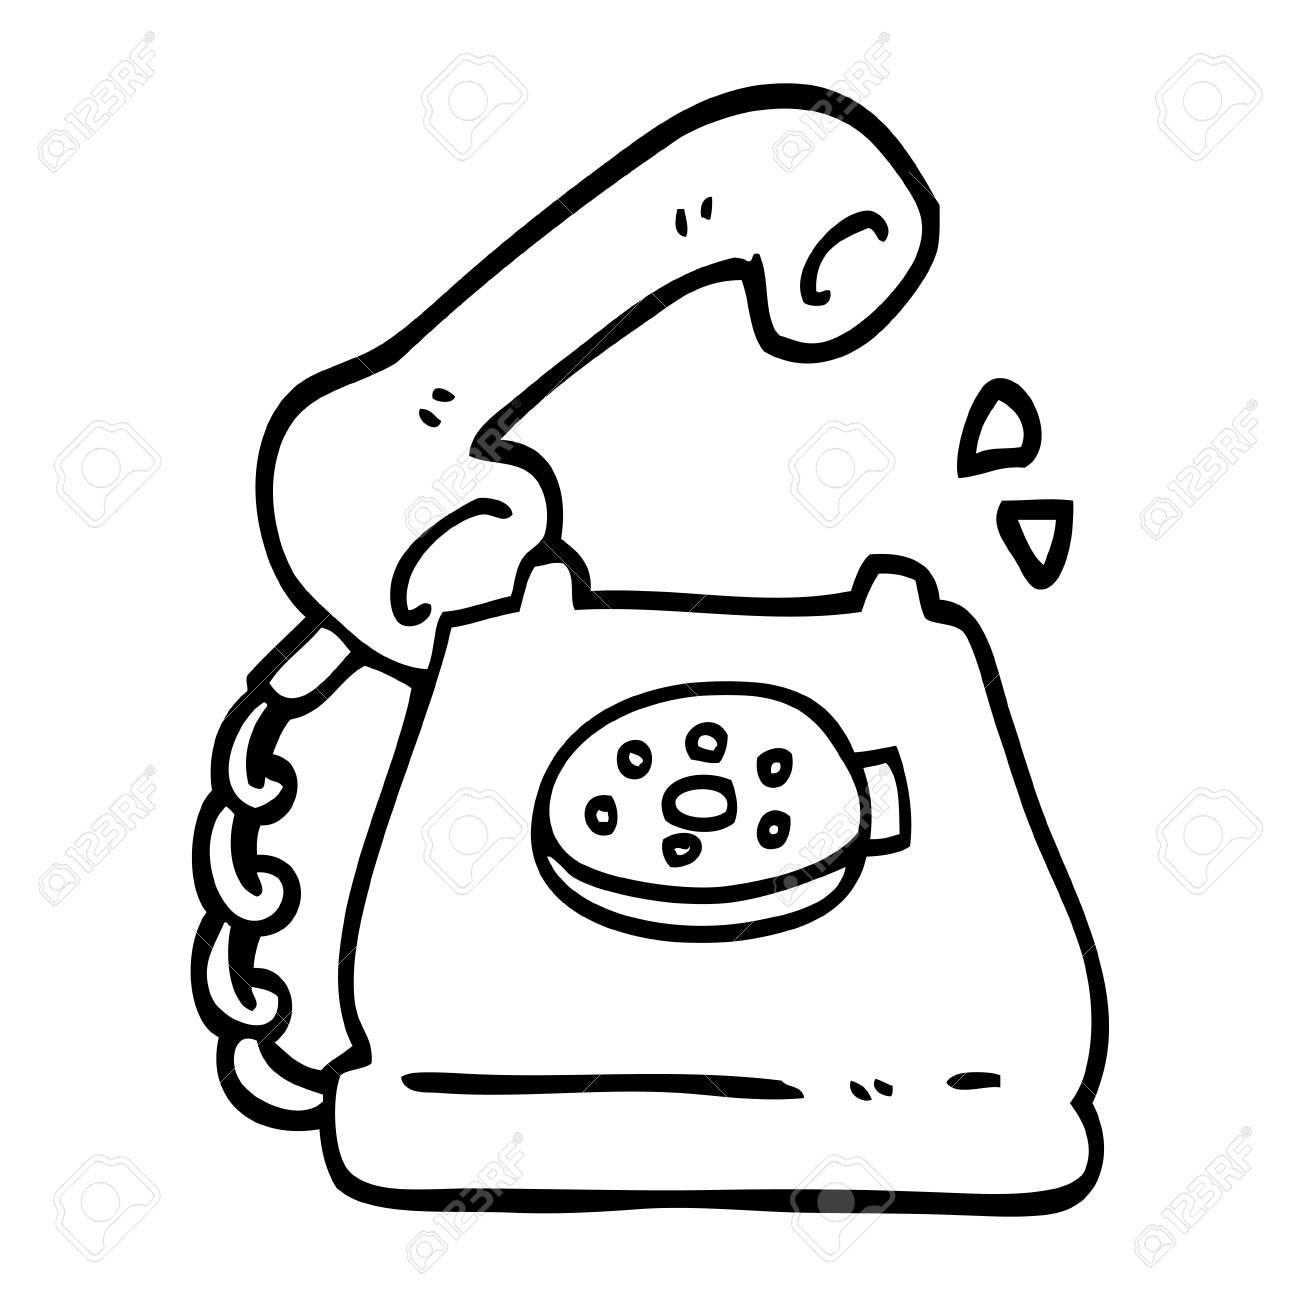 black and white cartoon telephone ringing.